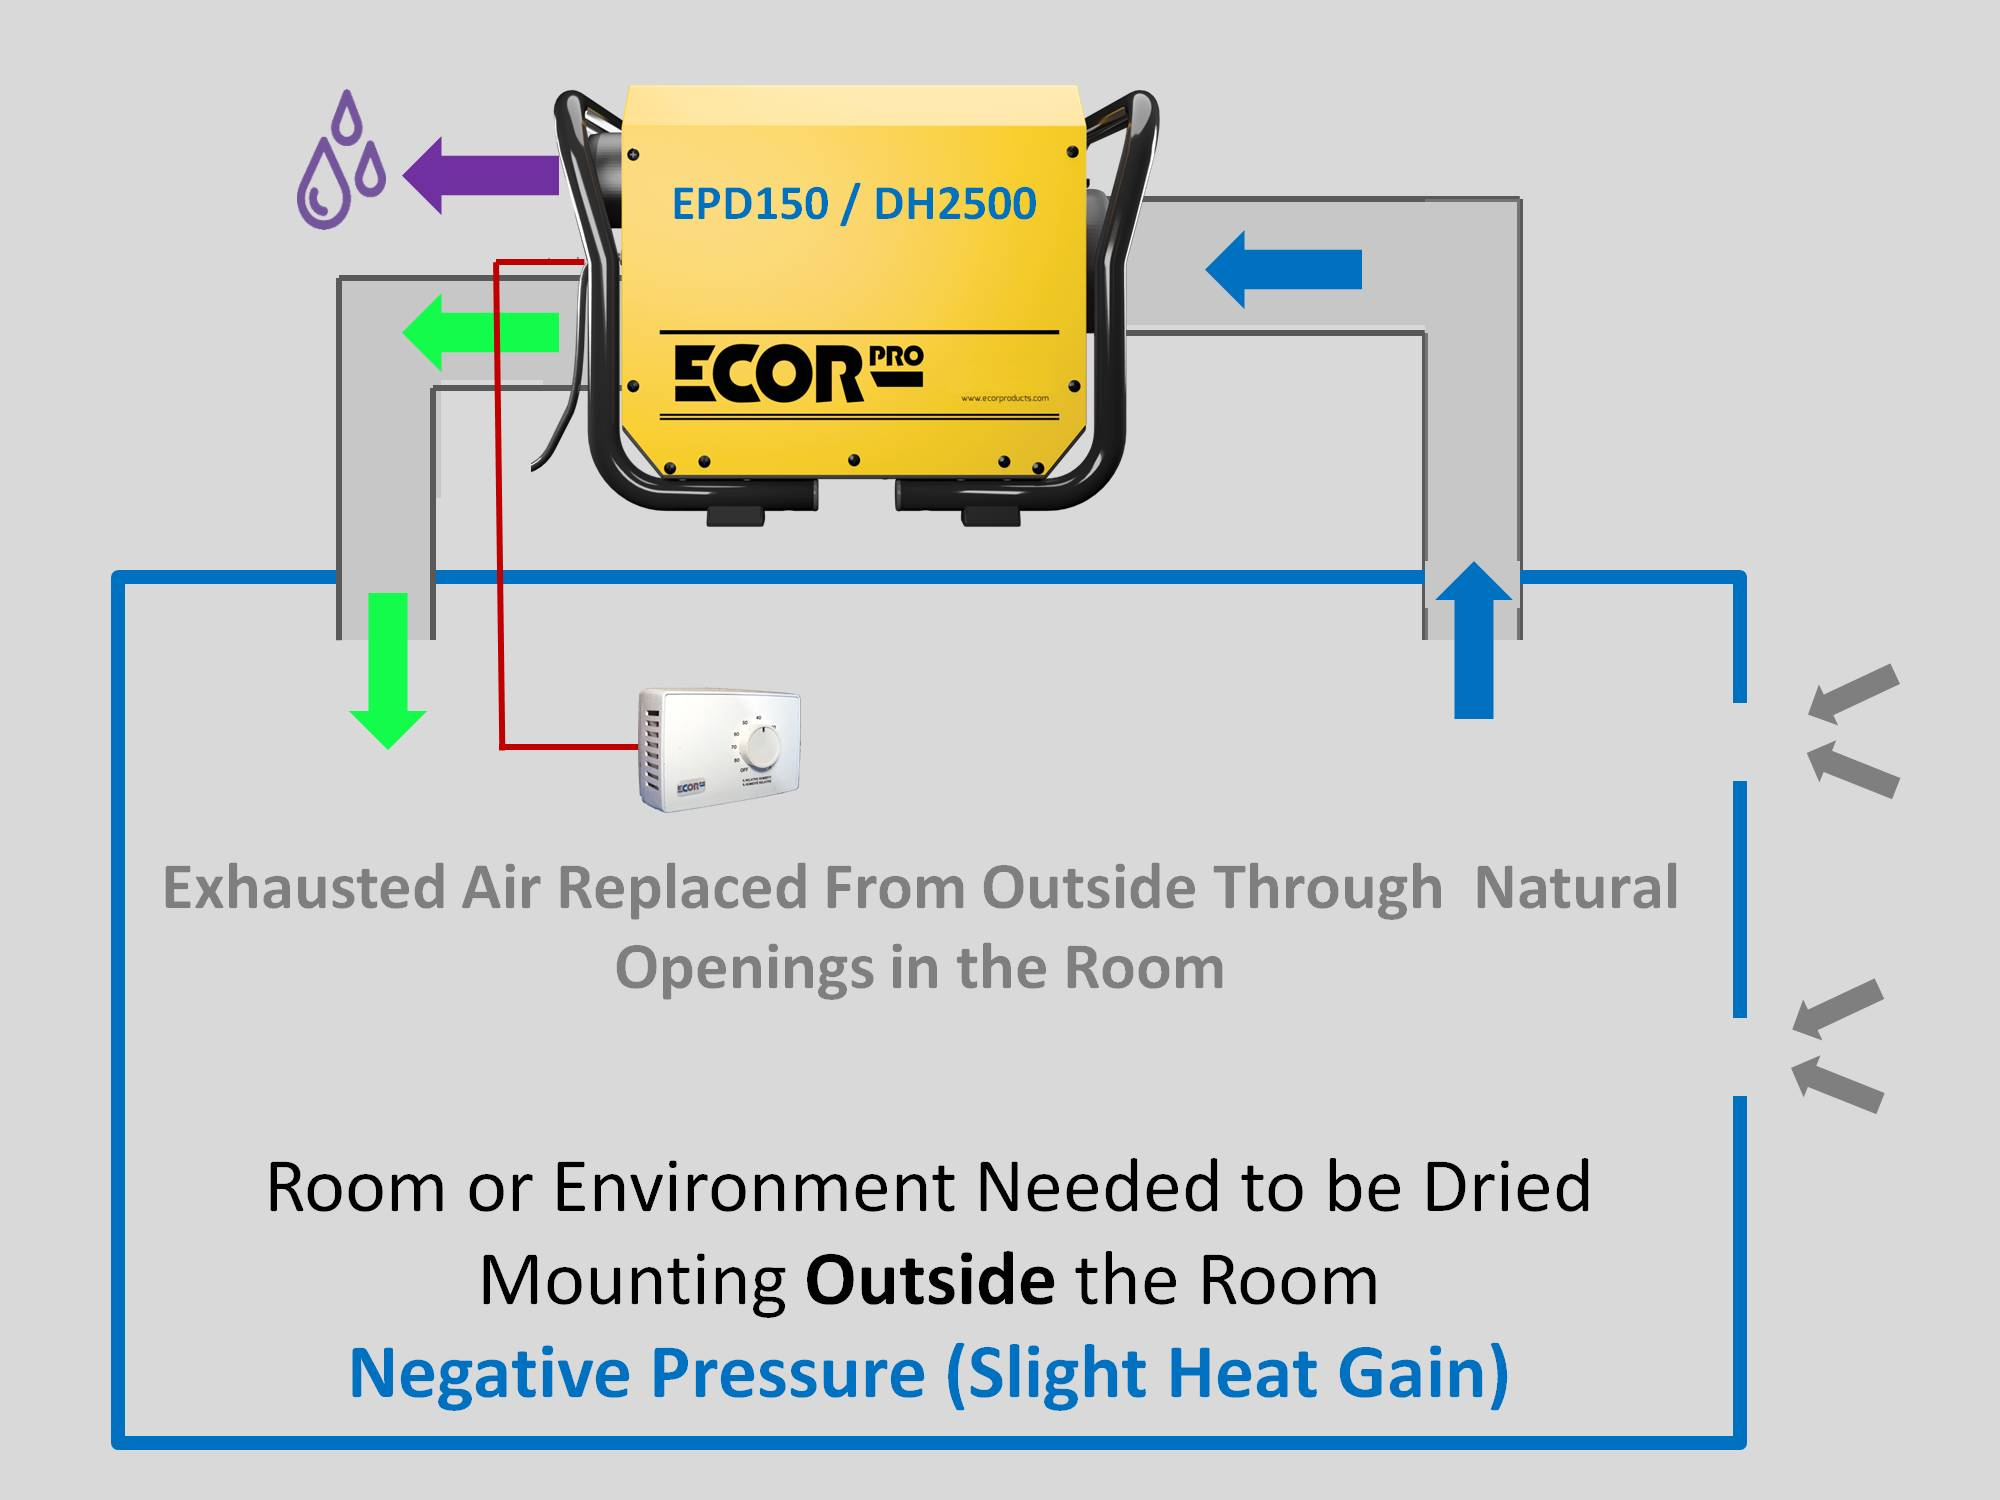 dehumidifier EPD150 DH2500 dehumidifiers by Ecor Pro